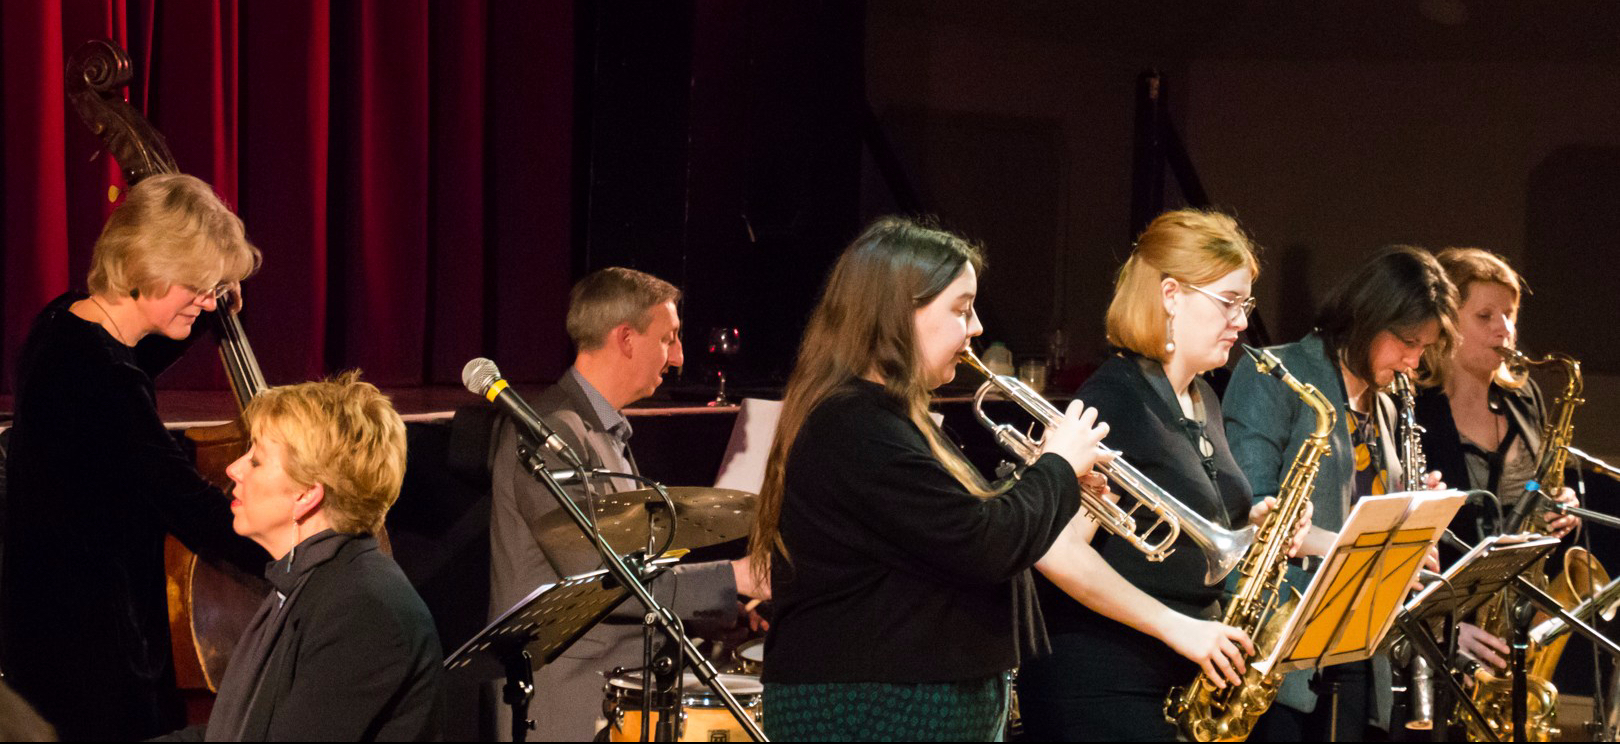 The Nikki Iles All Star Septet performing at Fleet Jazz on 19th Feb 2019.